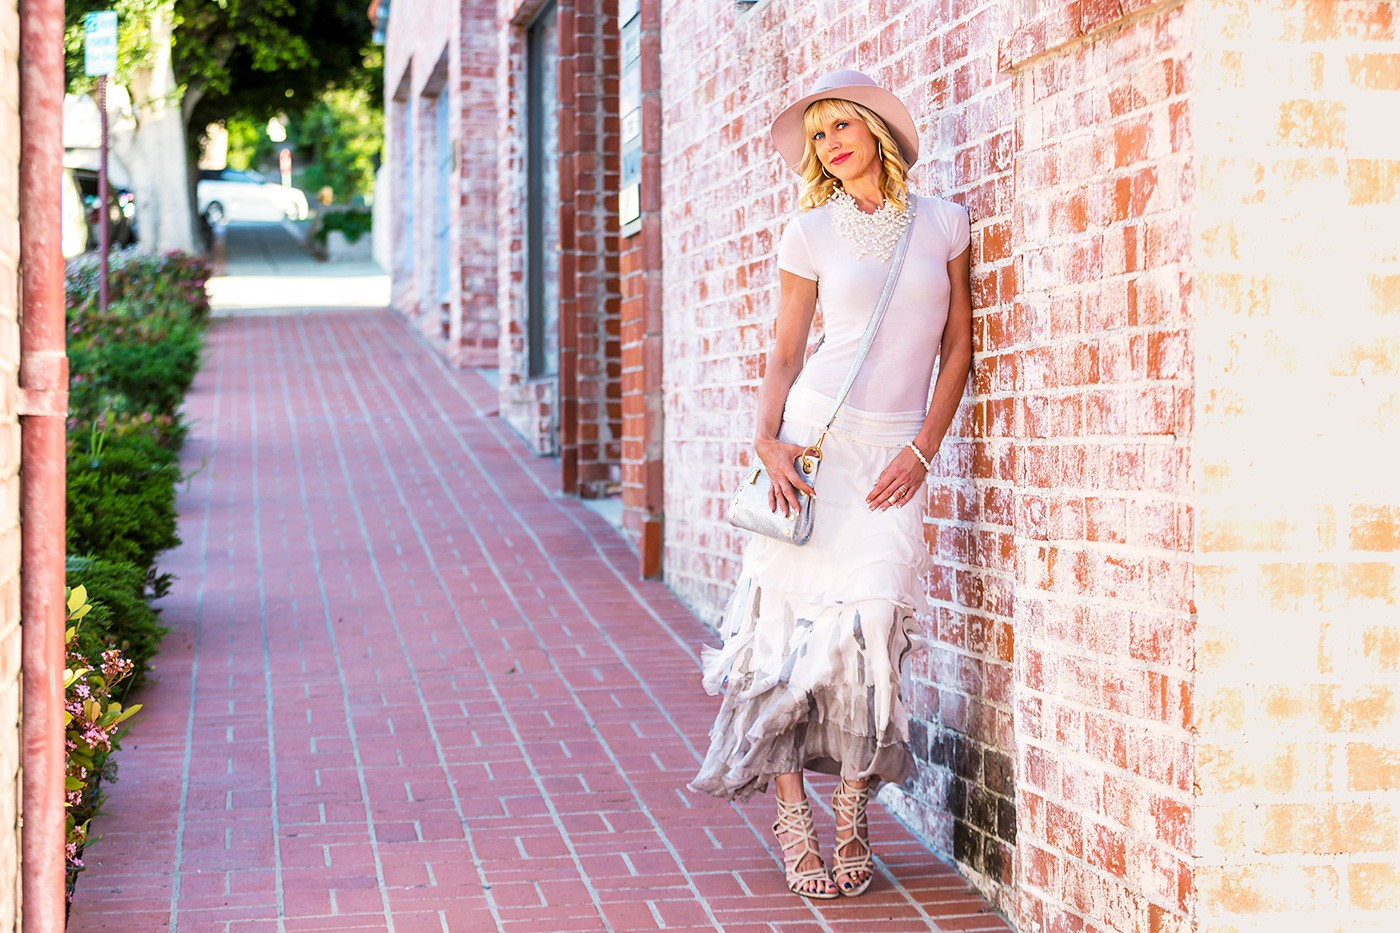 Purple Poppy Skirt Michael Stars Hat Malaga Cove Street Shot